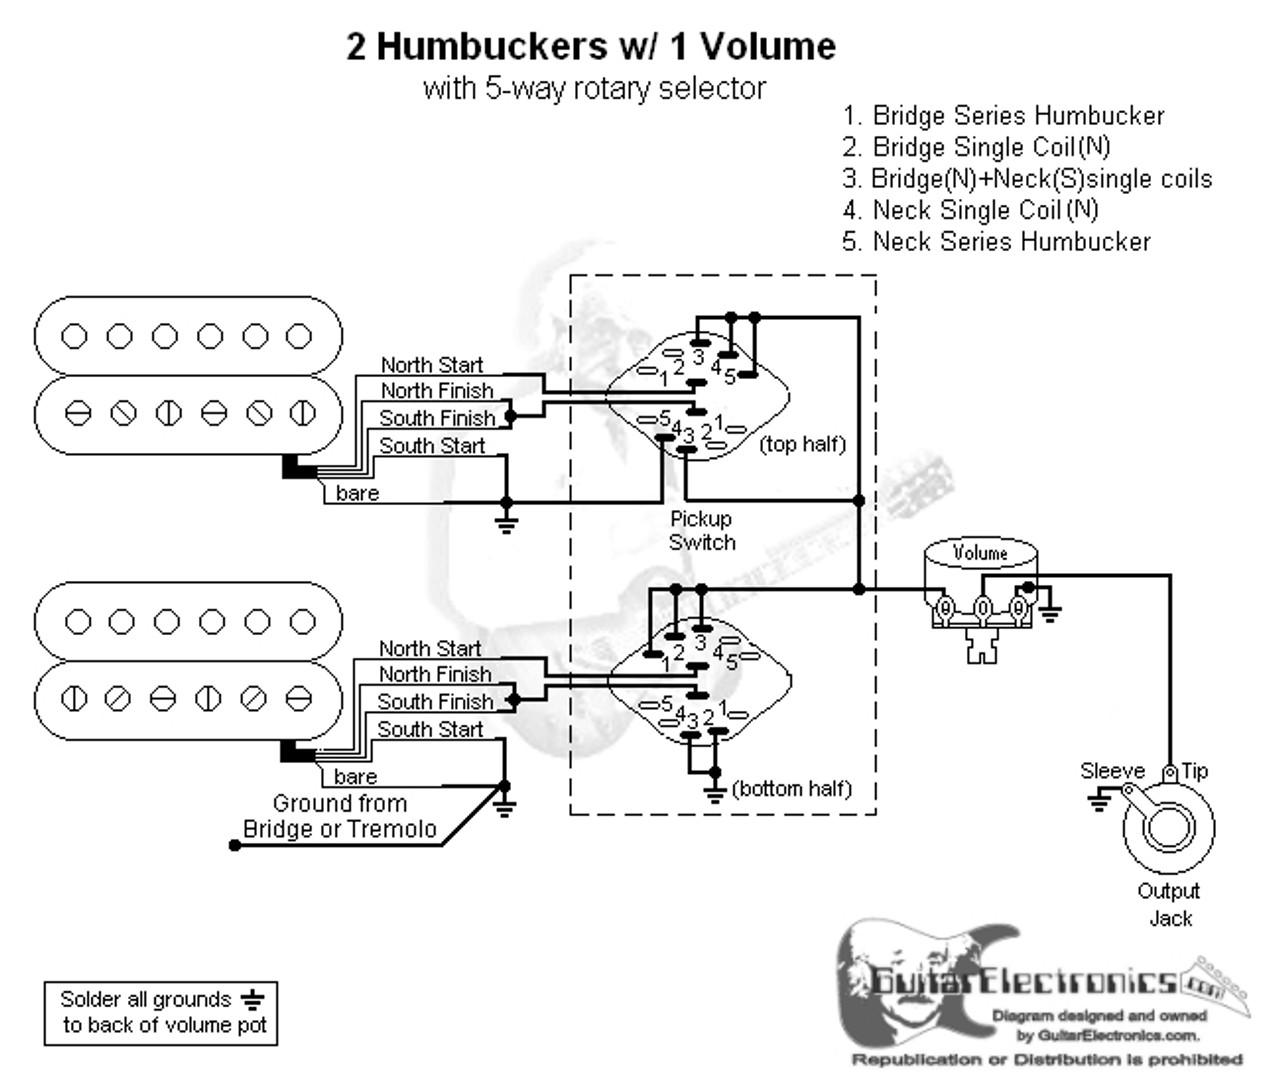 medium resolution of 2 humbuckers 5 way rotary switch 1 volume 01 5 way switch wiring diagram leviton 5 way rotary switch wiring diagram